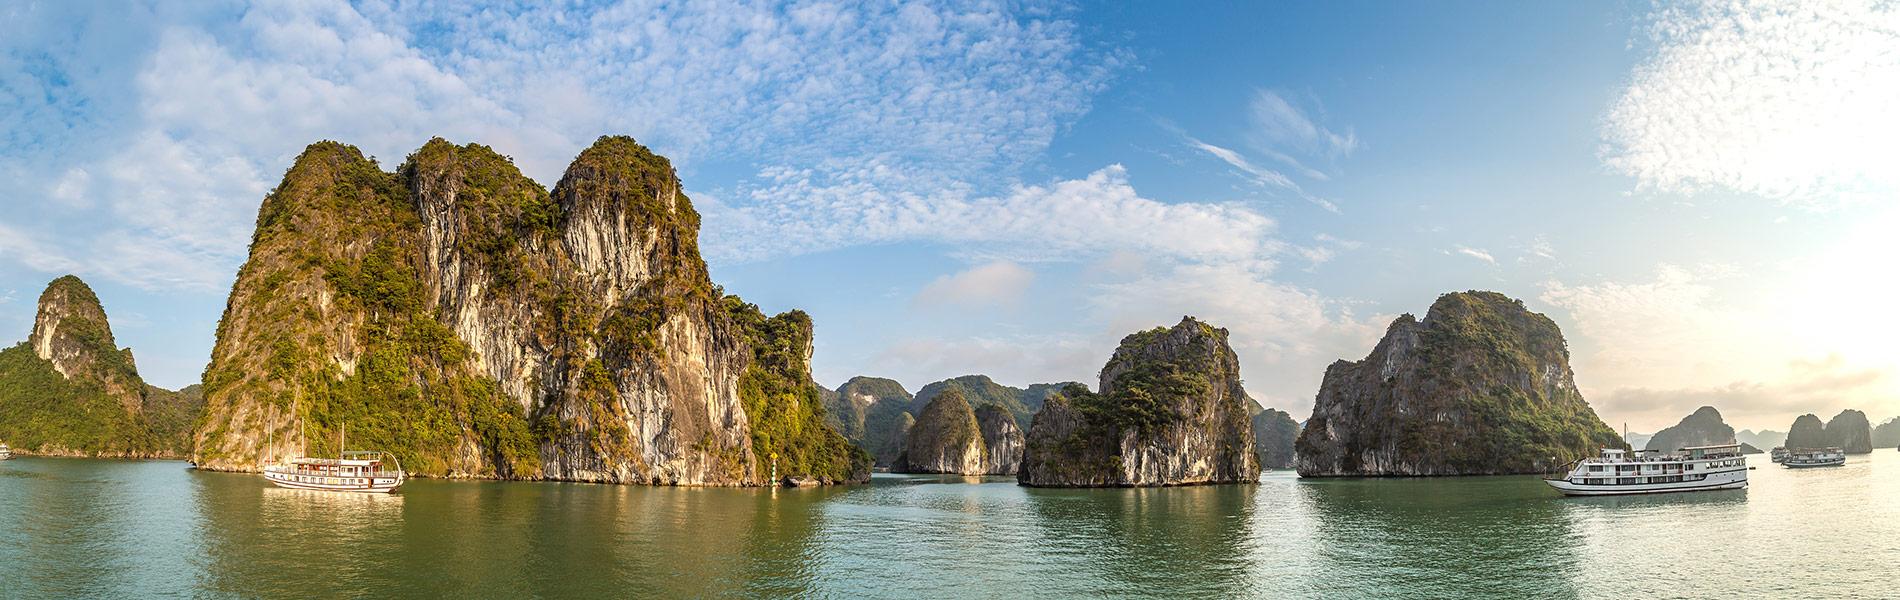 Halong bay in Summer